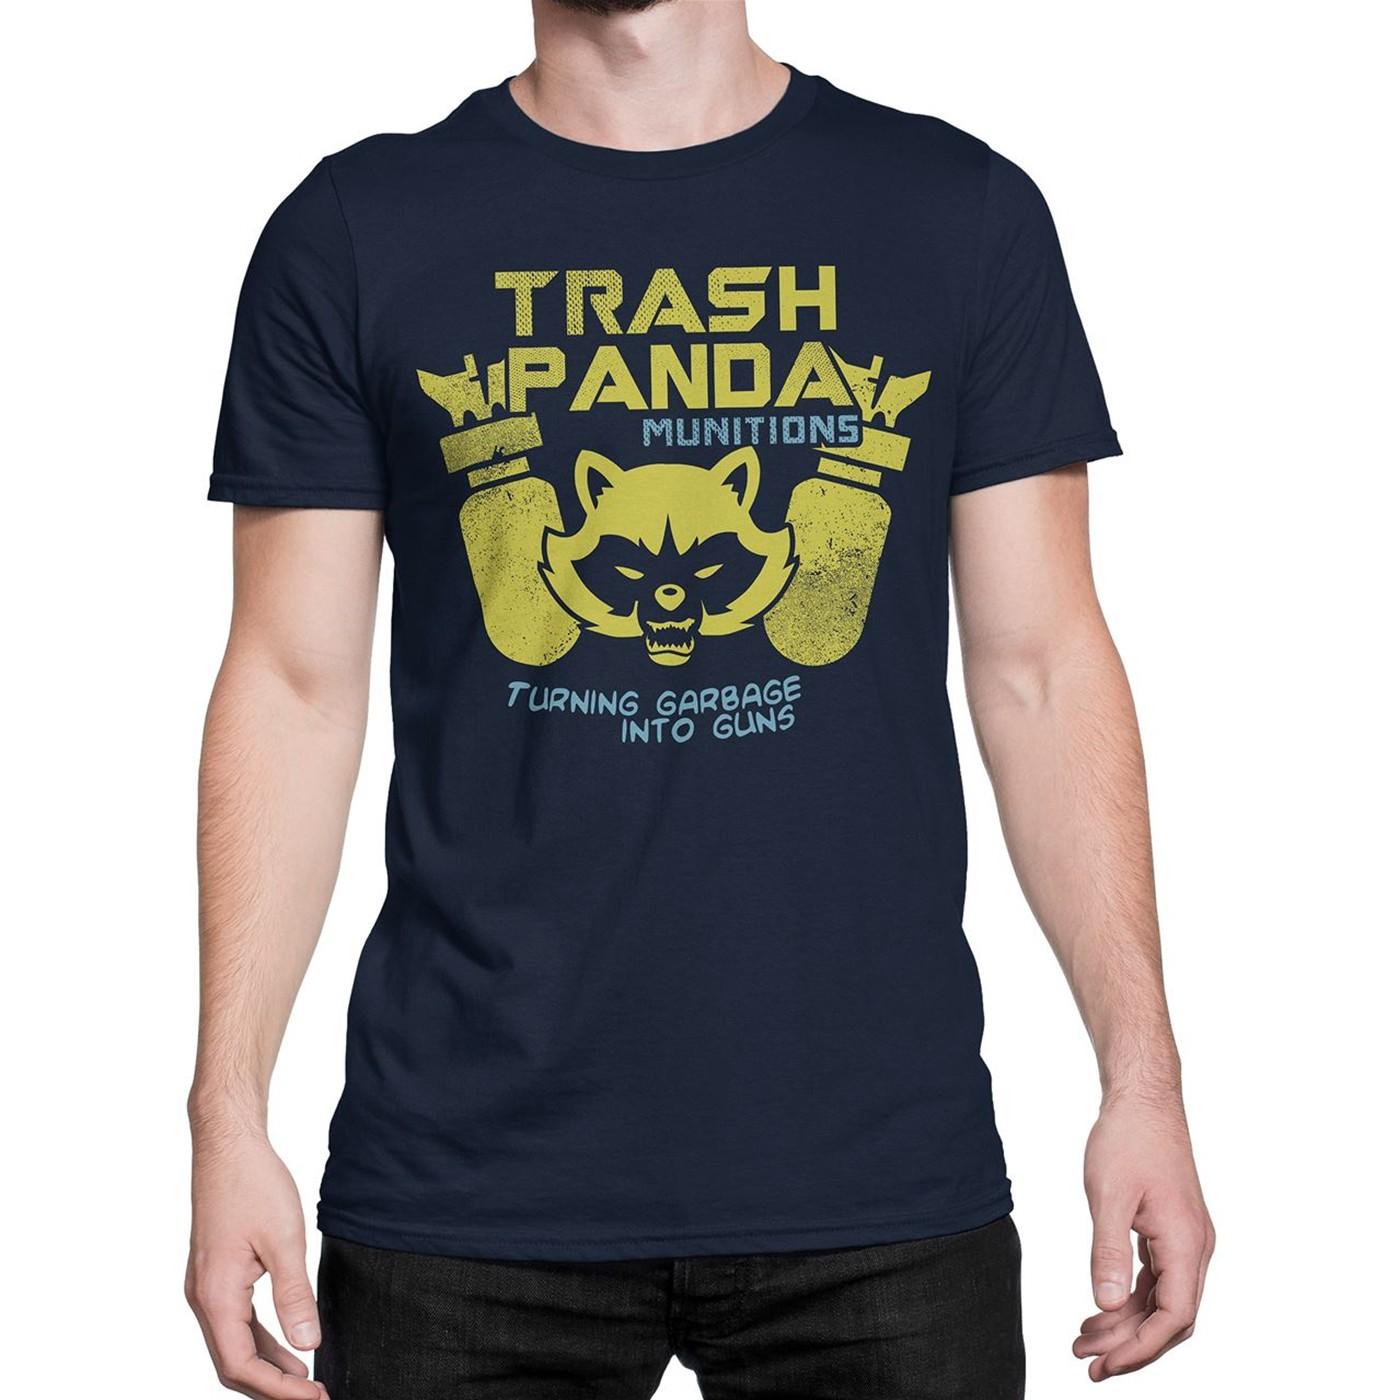 Trash Panda Munitions Men's T-Shirt